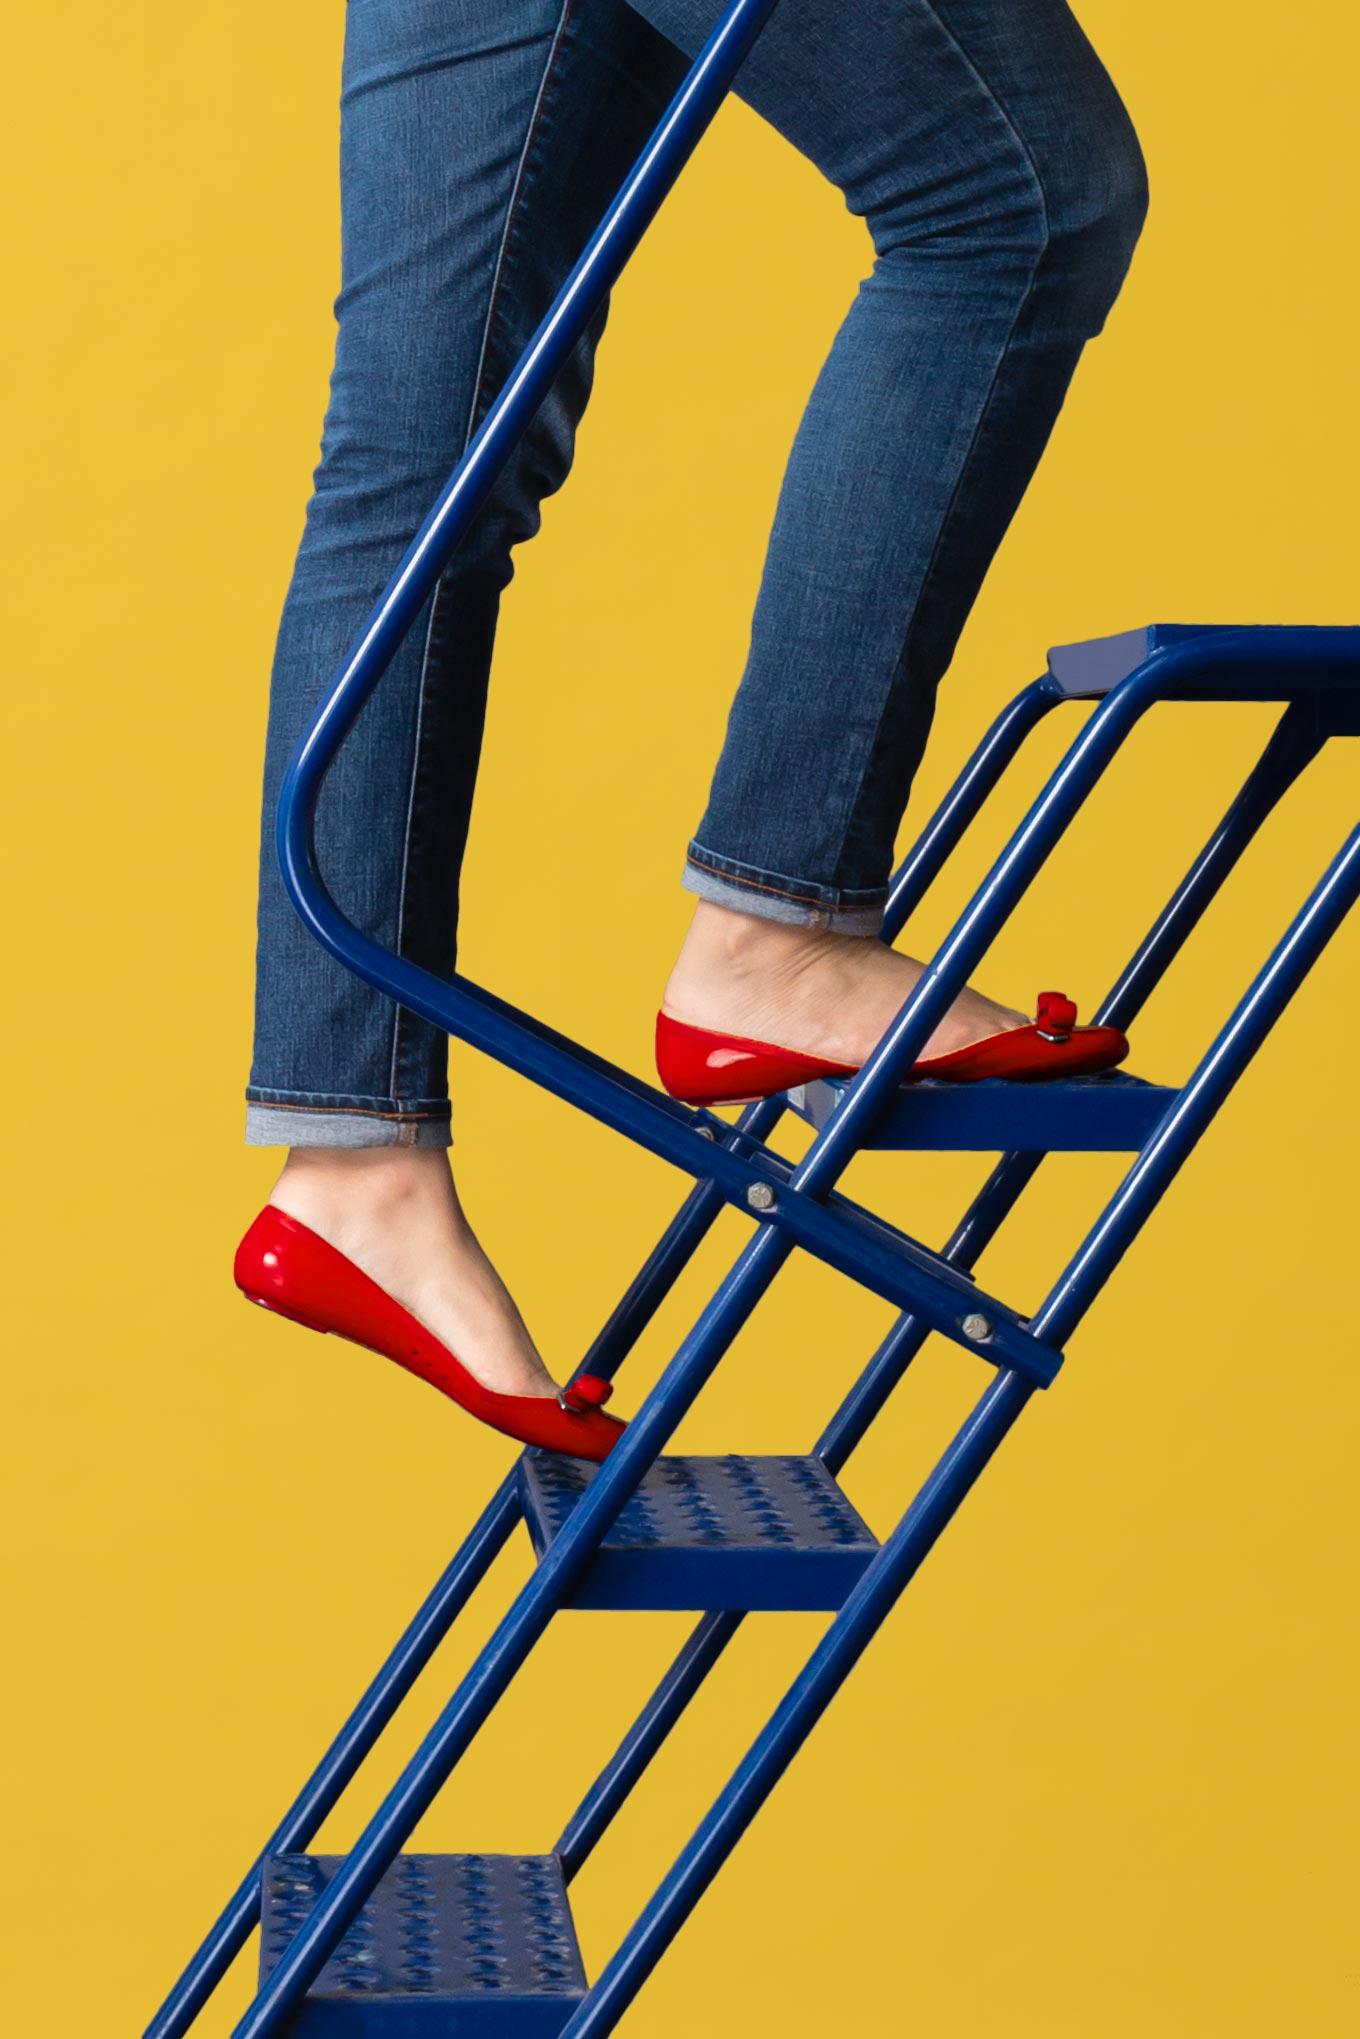 Ladder_Climb.jpg